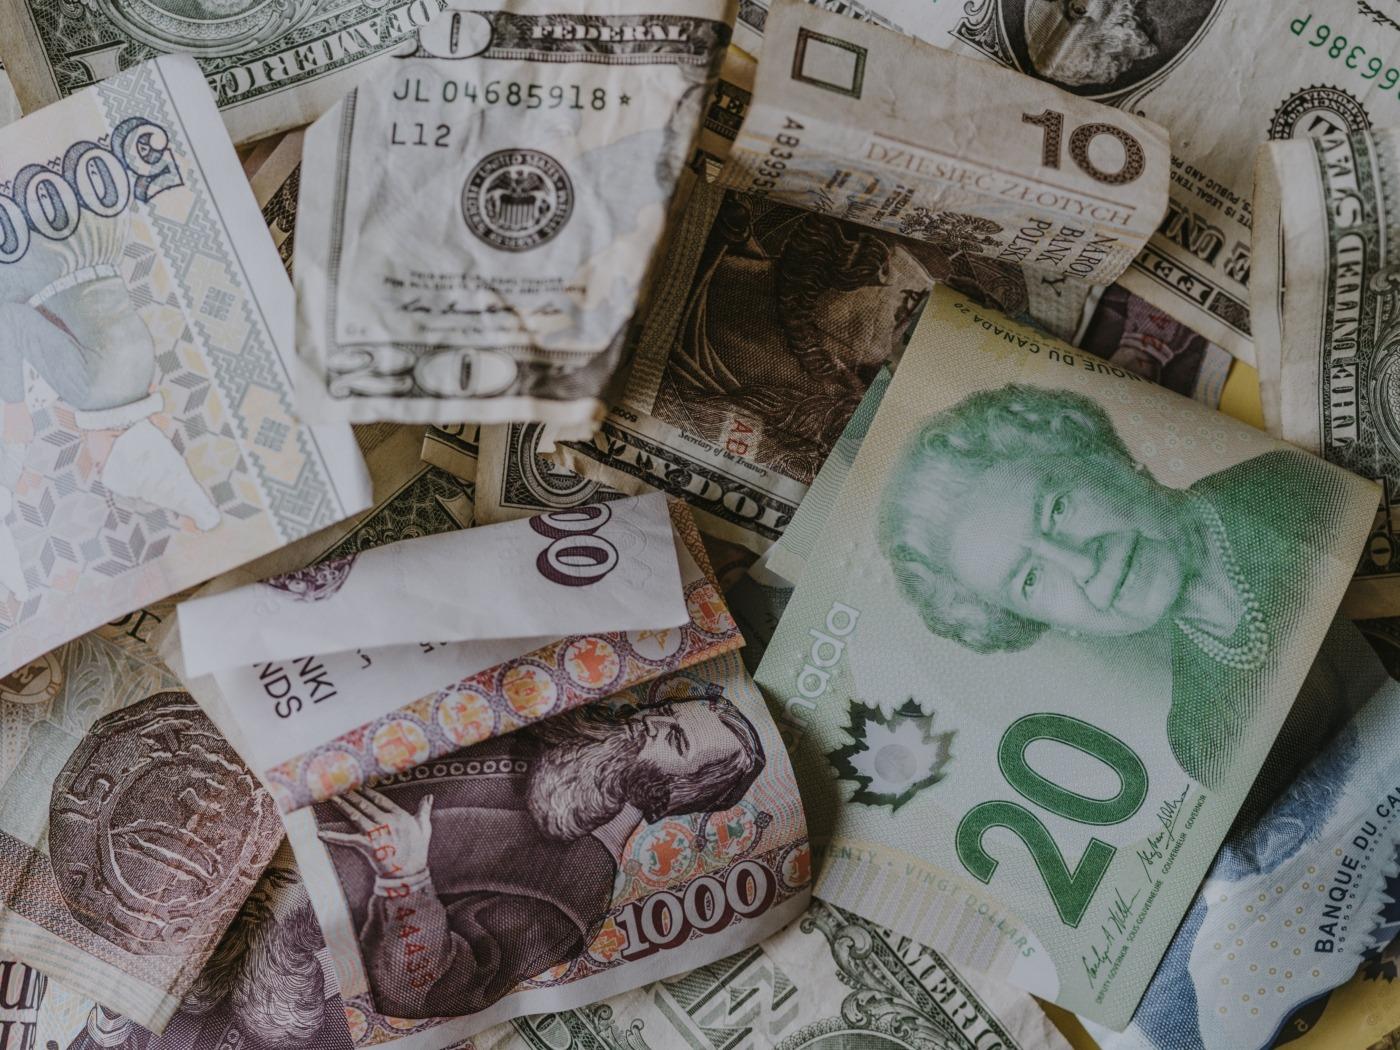 Bank notes / Image: Unsplash